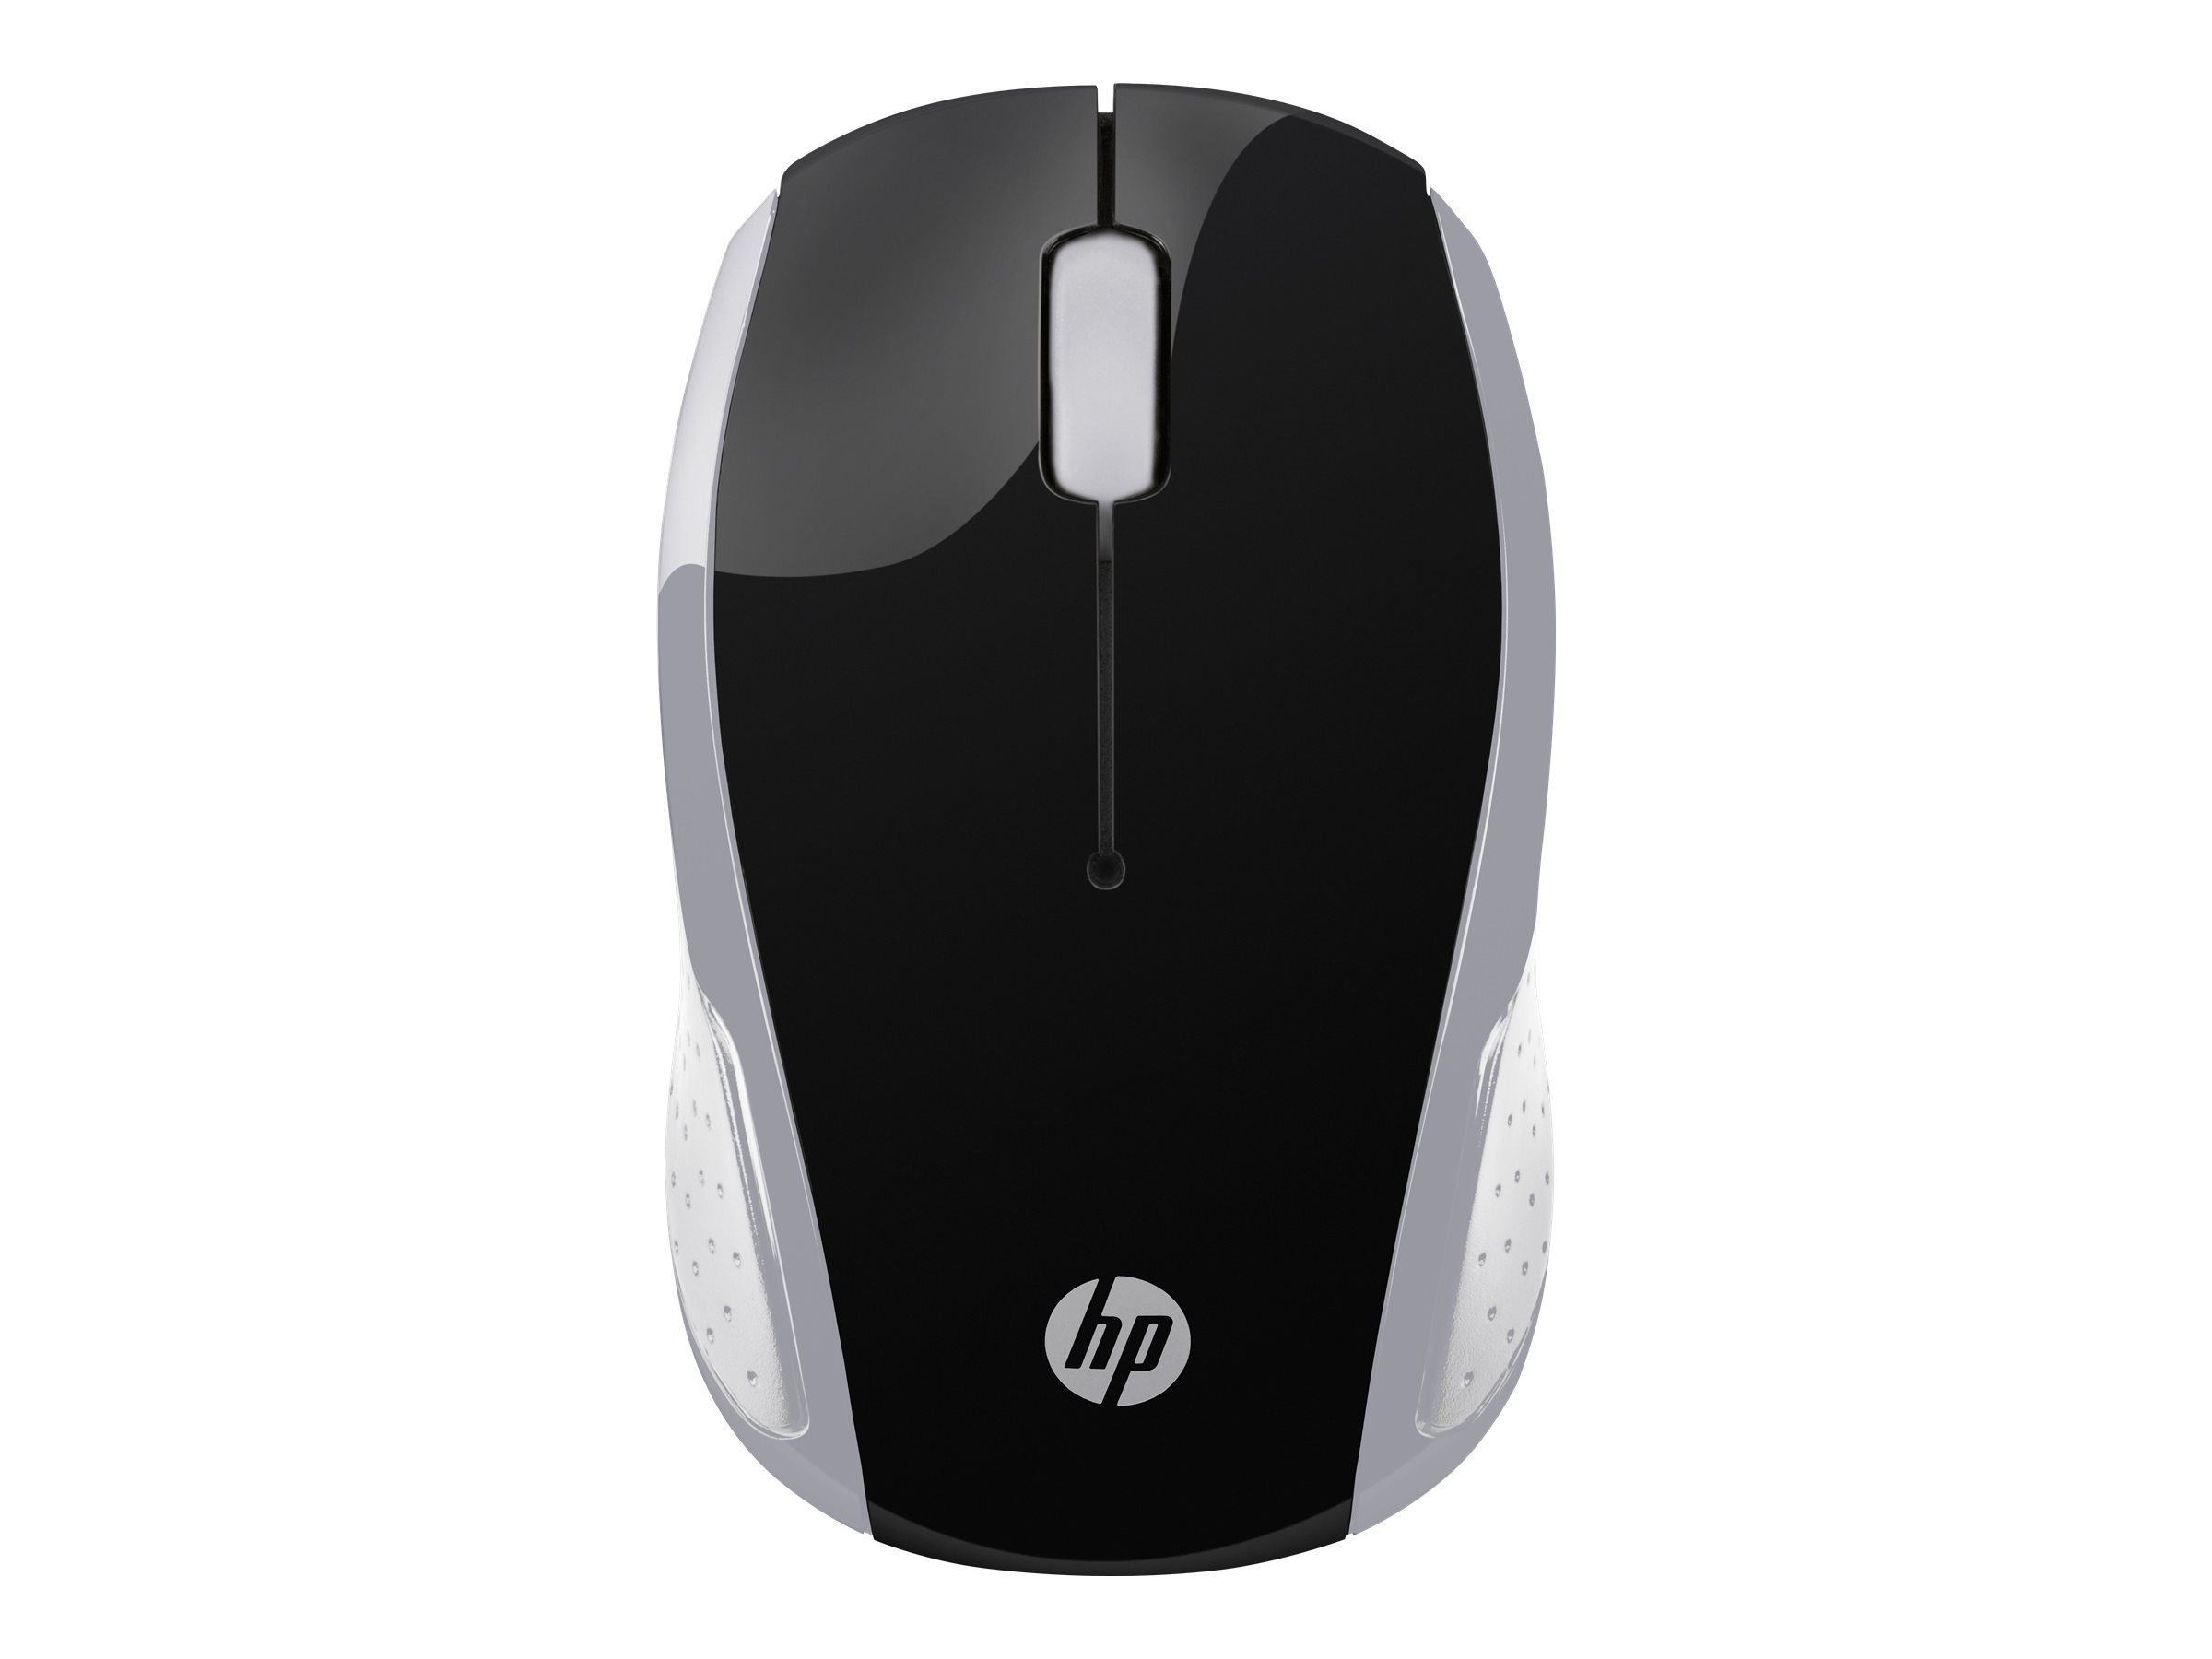 HP 200 - Maus - rechts- und linkshändig - optisch - kabellos - 2.4 GHz